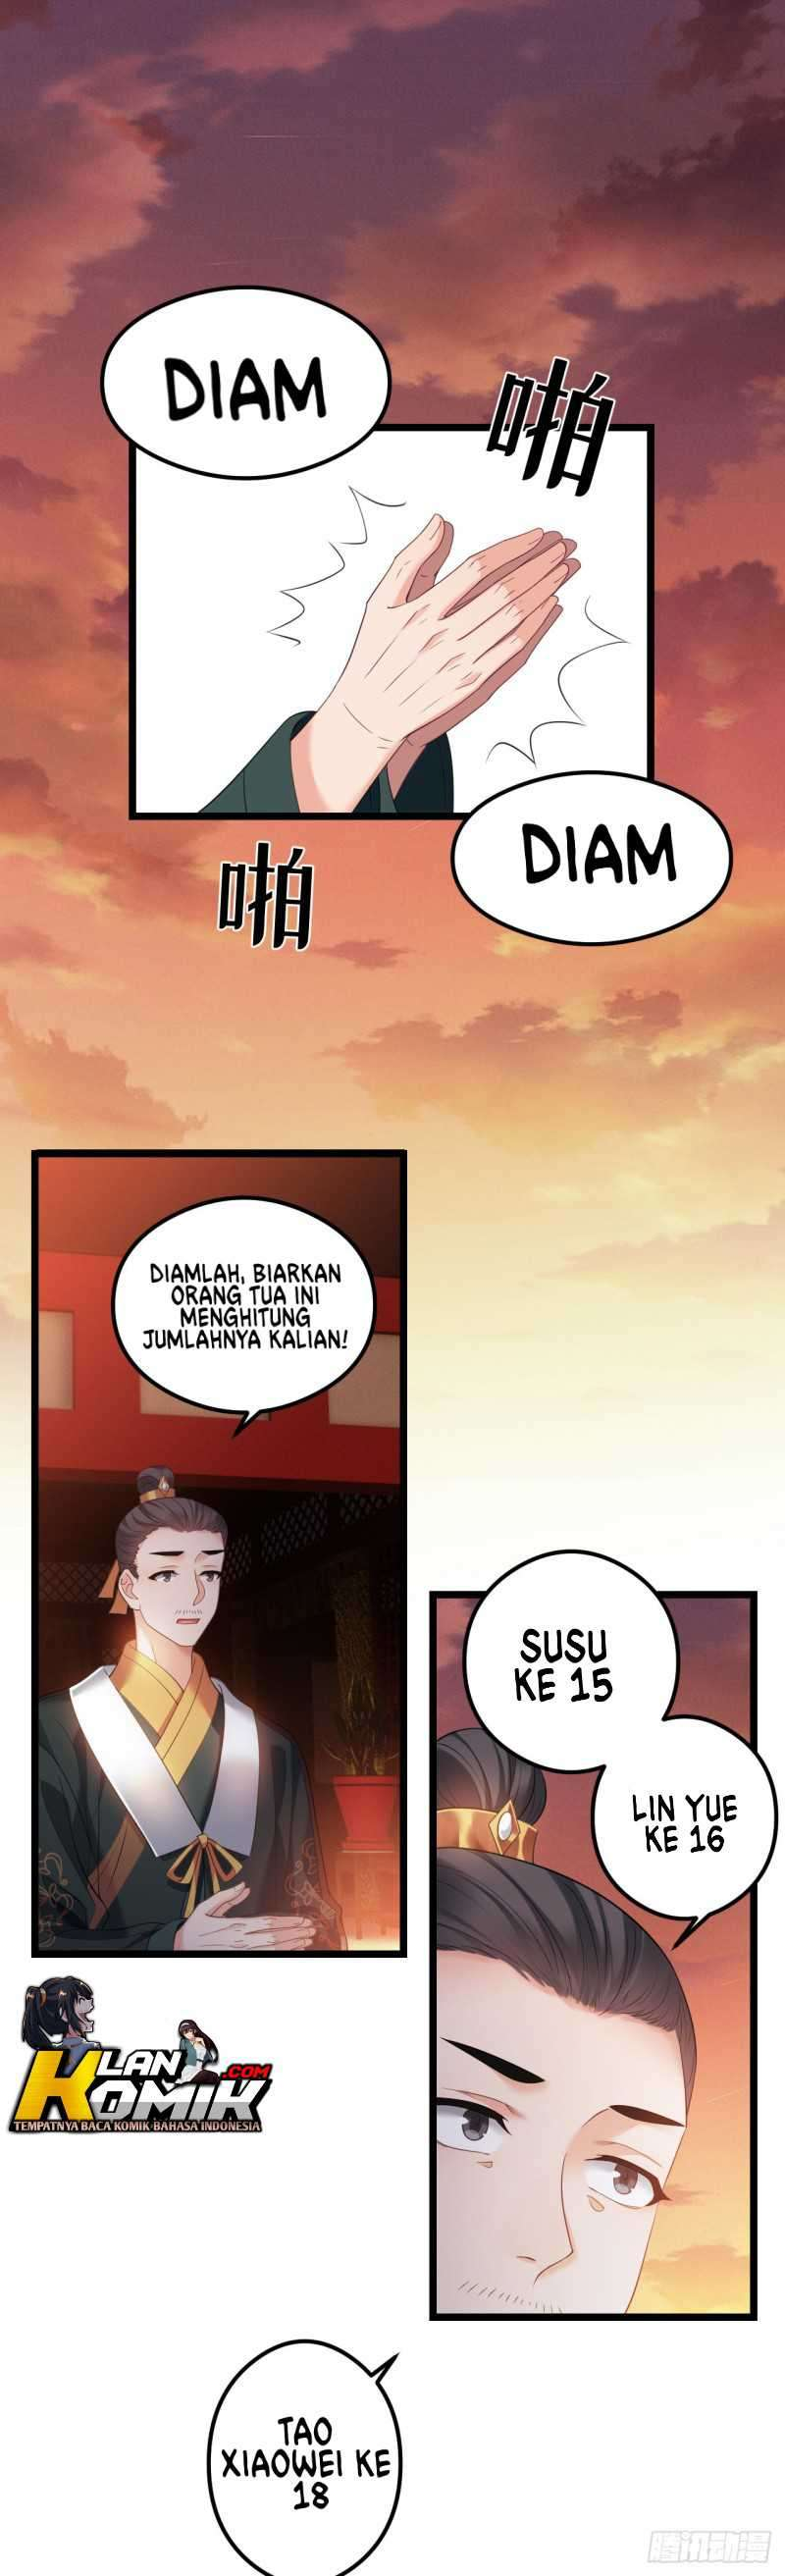 I Won't Marry The Enemy Prince Chapter 42 - Komik Terbaru